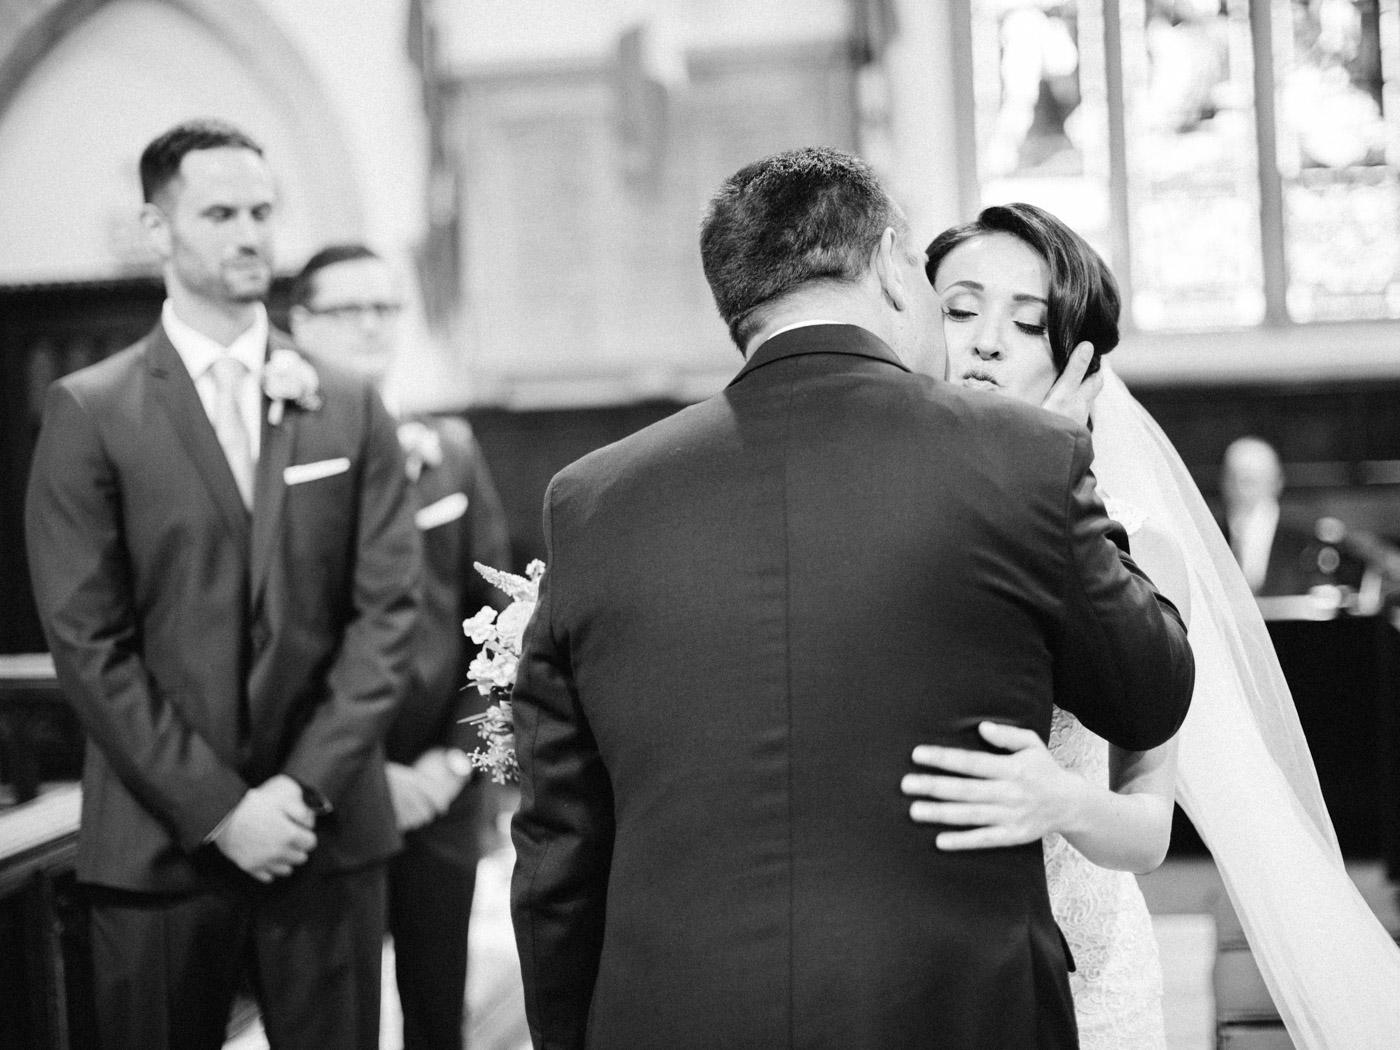 toronto_wedding_photographer_fine_art_documentary-166.jpg